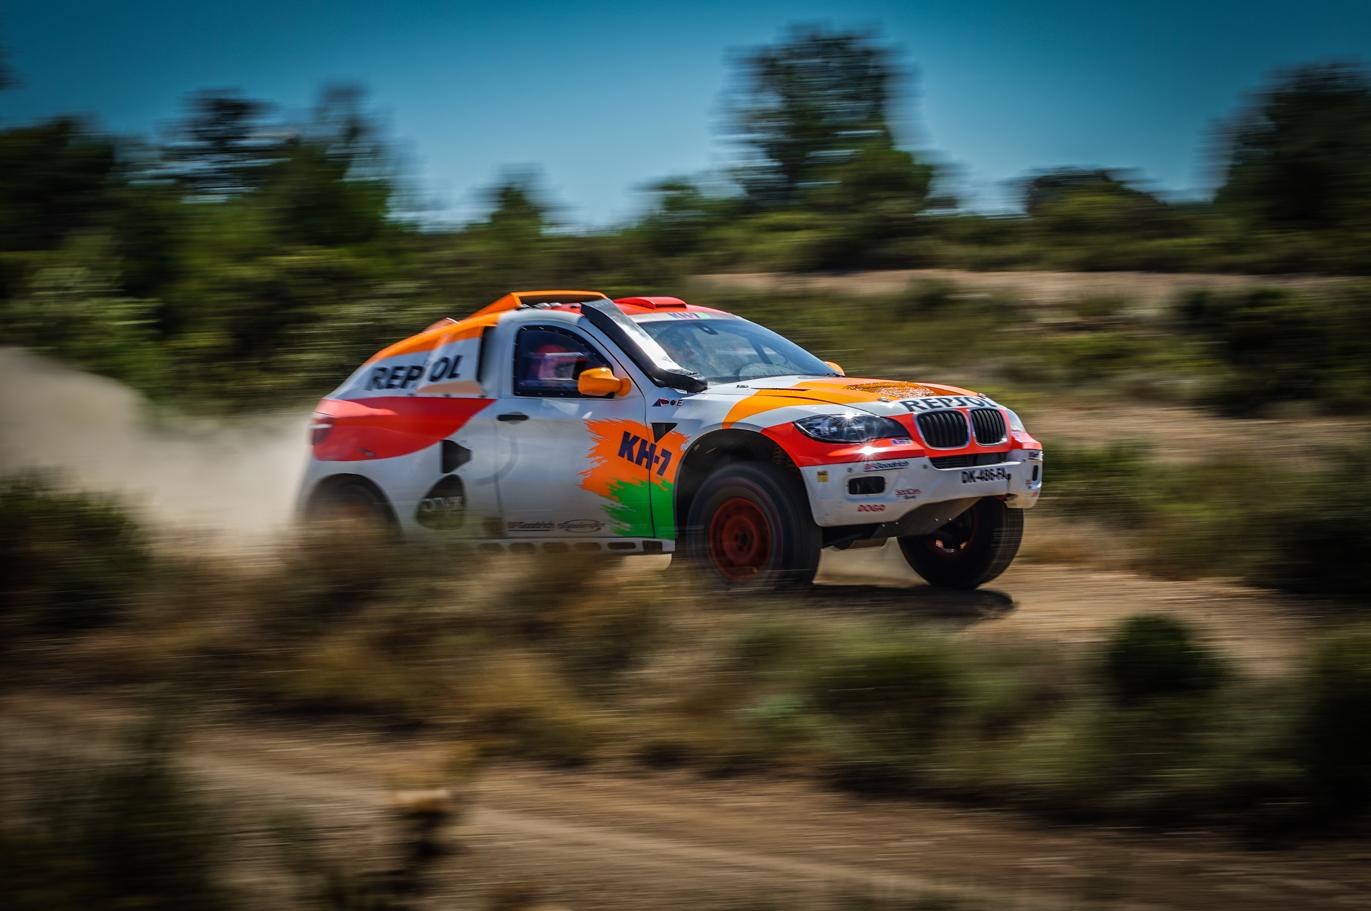 Coche del Repsol Rally team a toda velocidad